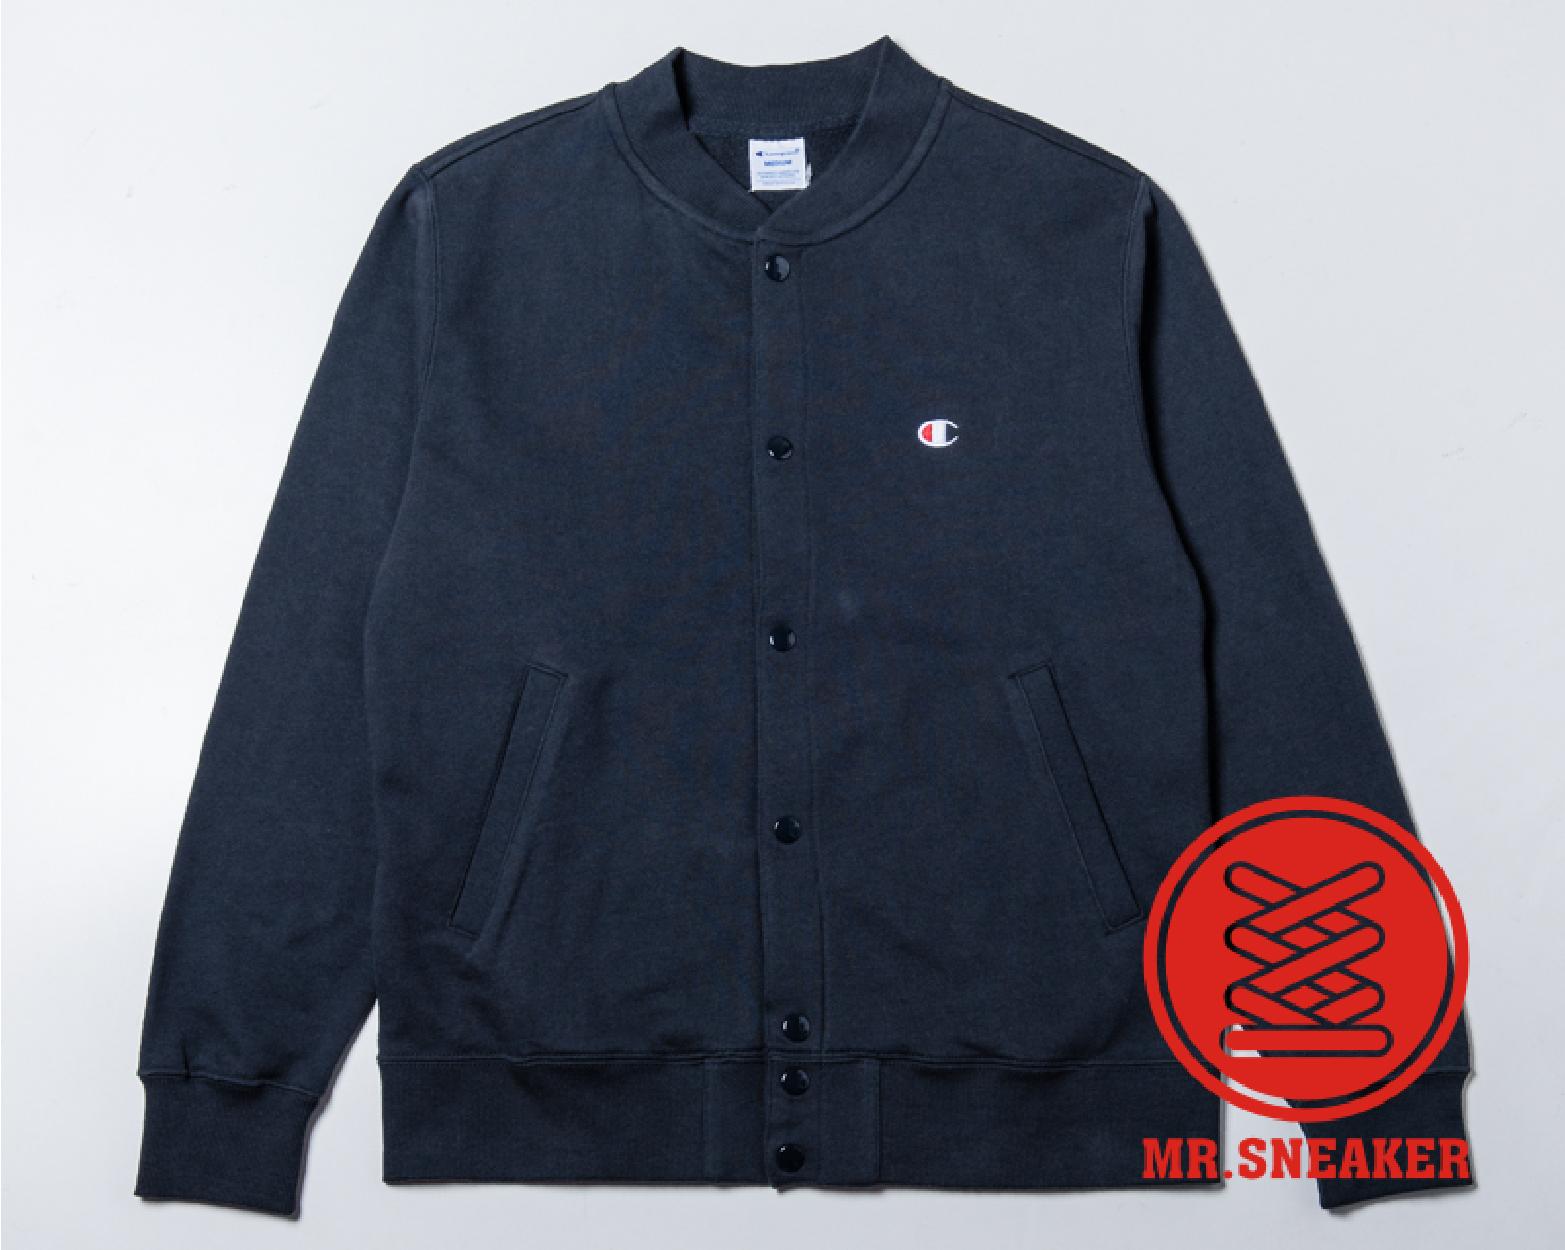 ☆Mr.Sneaker☆ Champion 日線 Basic french terry 棒球外套 毛圈布料 基本款 深藍